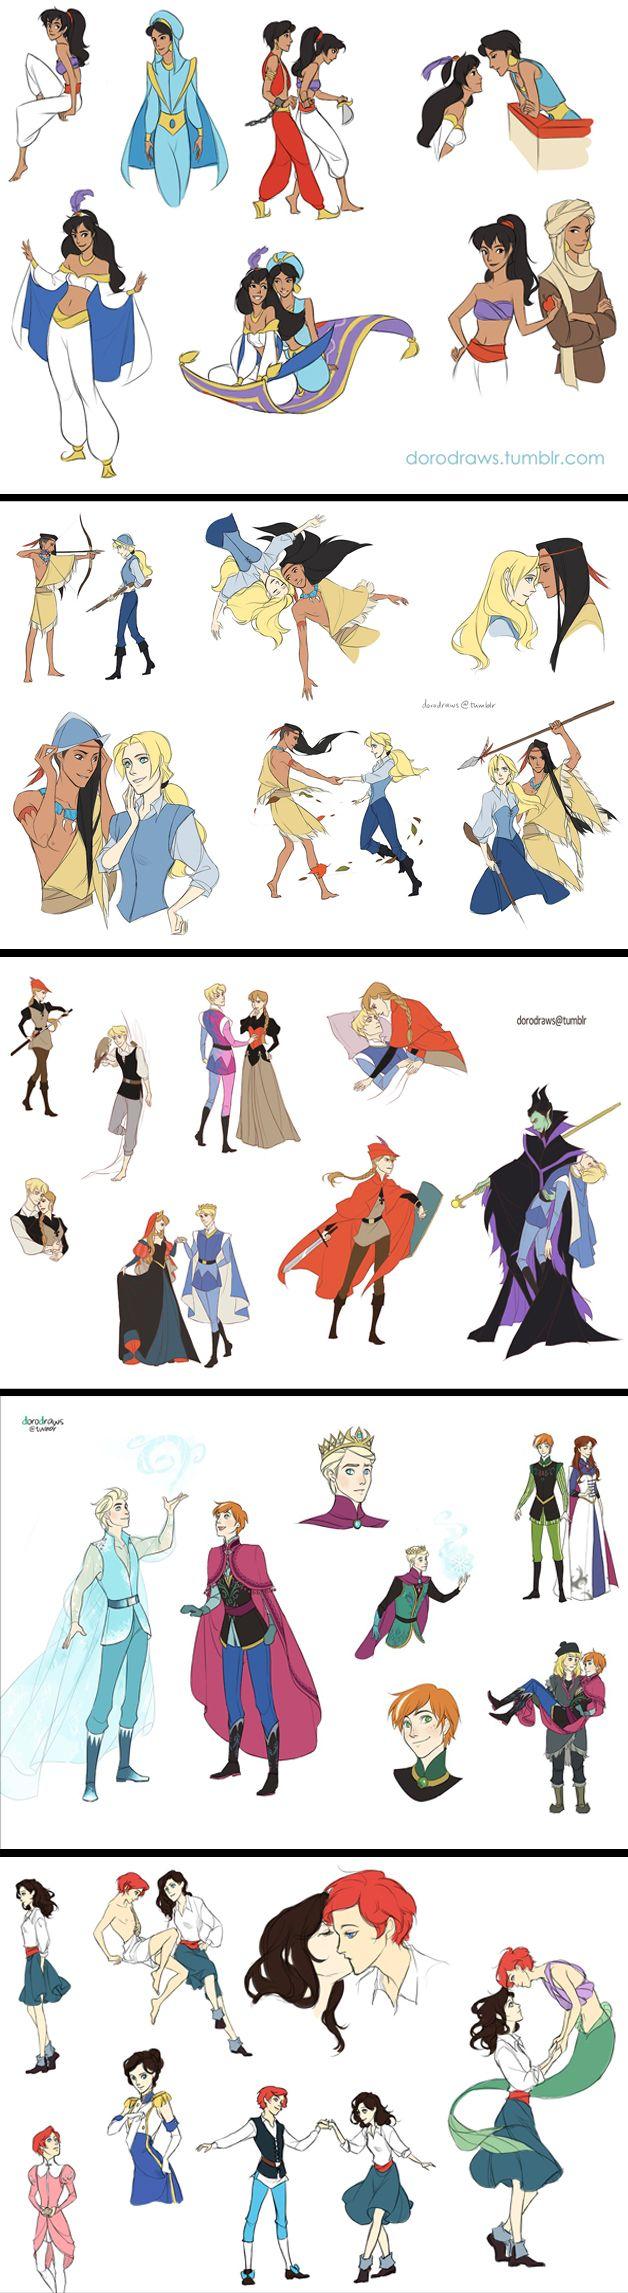 Disney Genderbent; Aladdin, Pocahontas, Sleeping Beauty, Frozen, The Little Mermaid